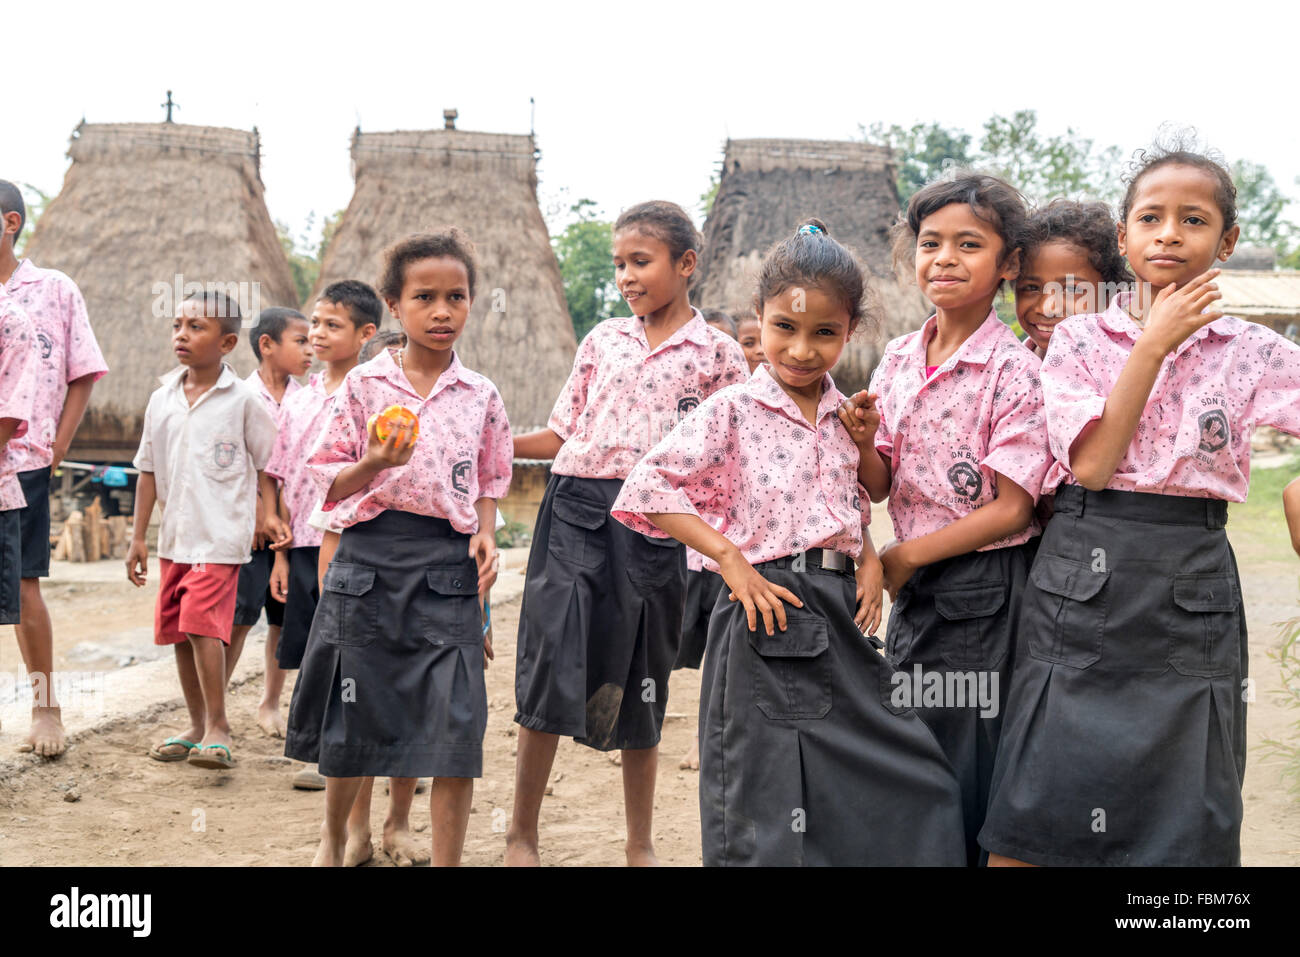 school children in uniform in the traditional Ngada village Bena near Bajawa, Flores, Indonesia, Asia - Stock Image